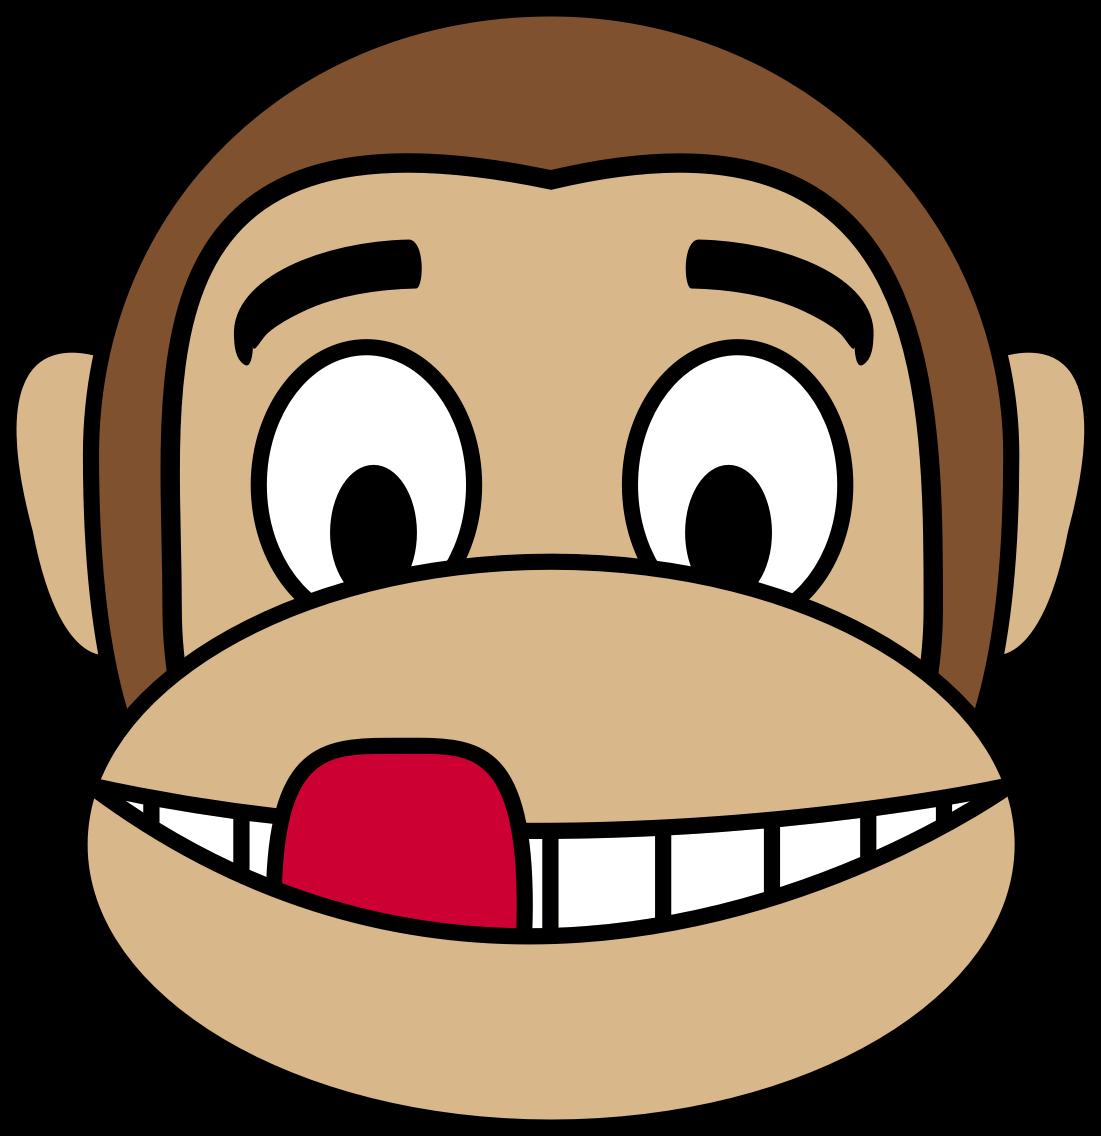 Ugly dog face clipart jpg library Monkey Face Clipart | Free download best Monkey Face Clipart on ... jpg library